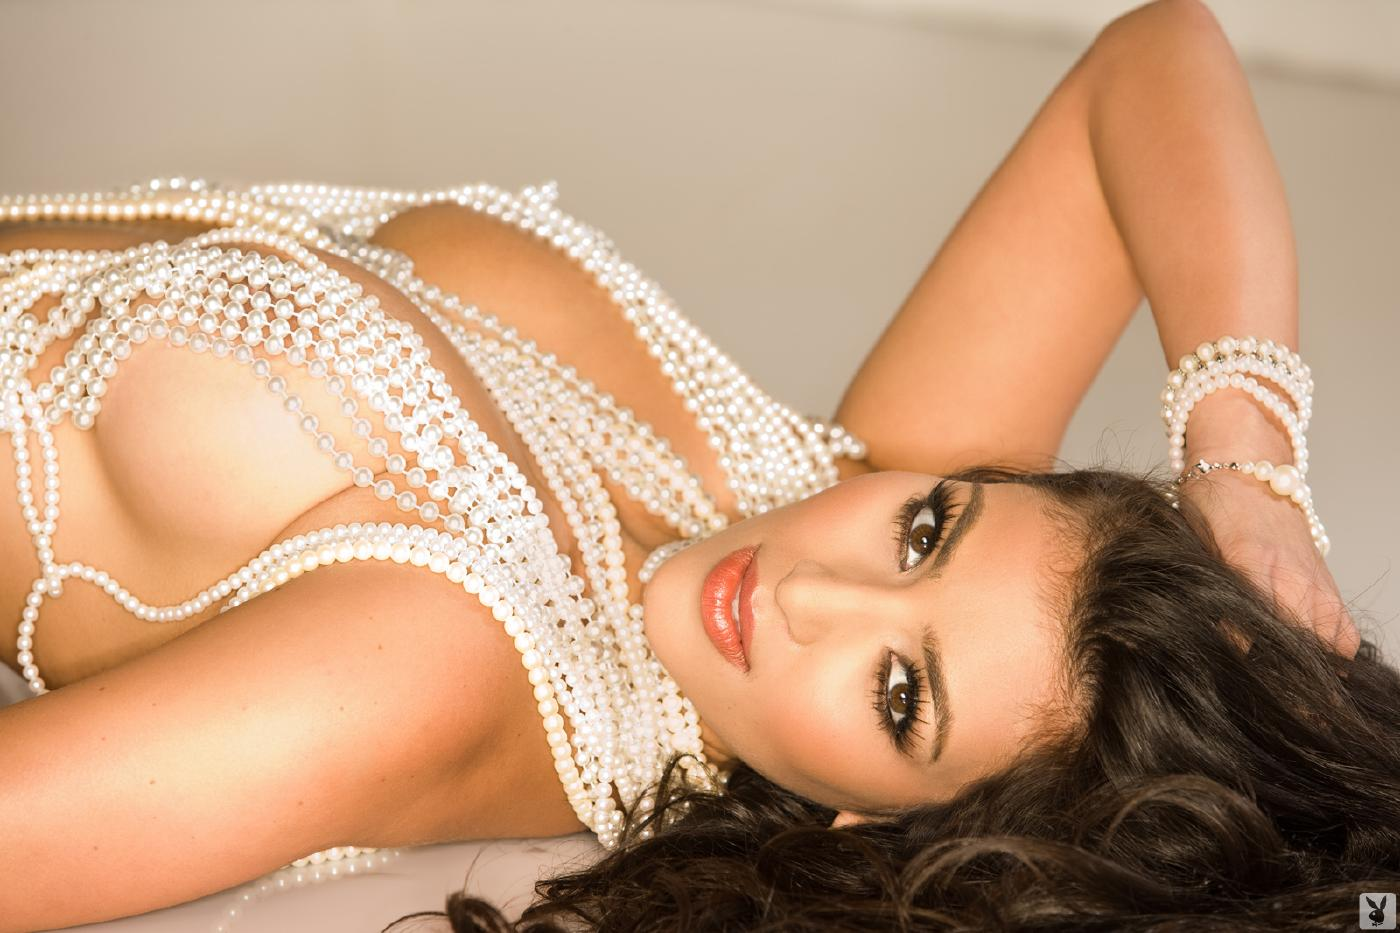 Kim Kardashian Nude Playboy Photoshoot Leaked Qlesrz